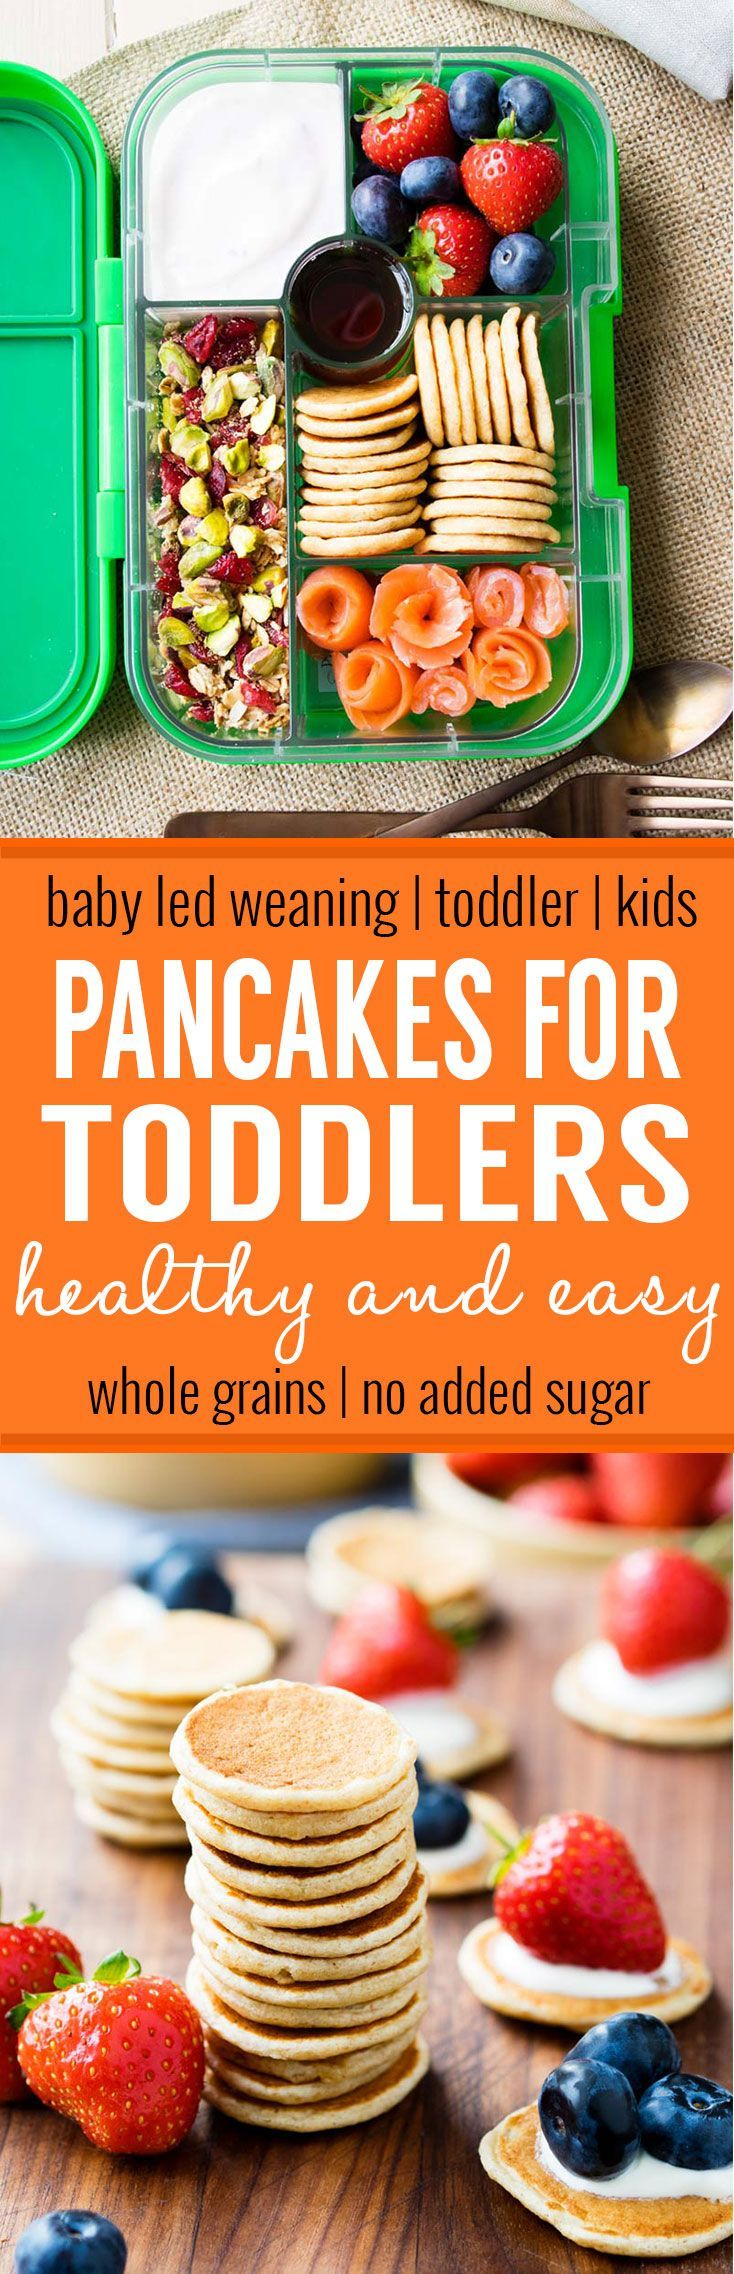 best nourish lunchbox images on pinterest healthy kids